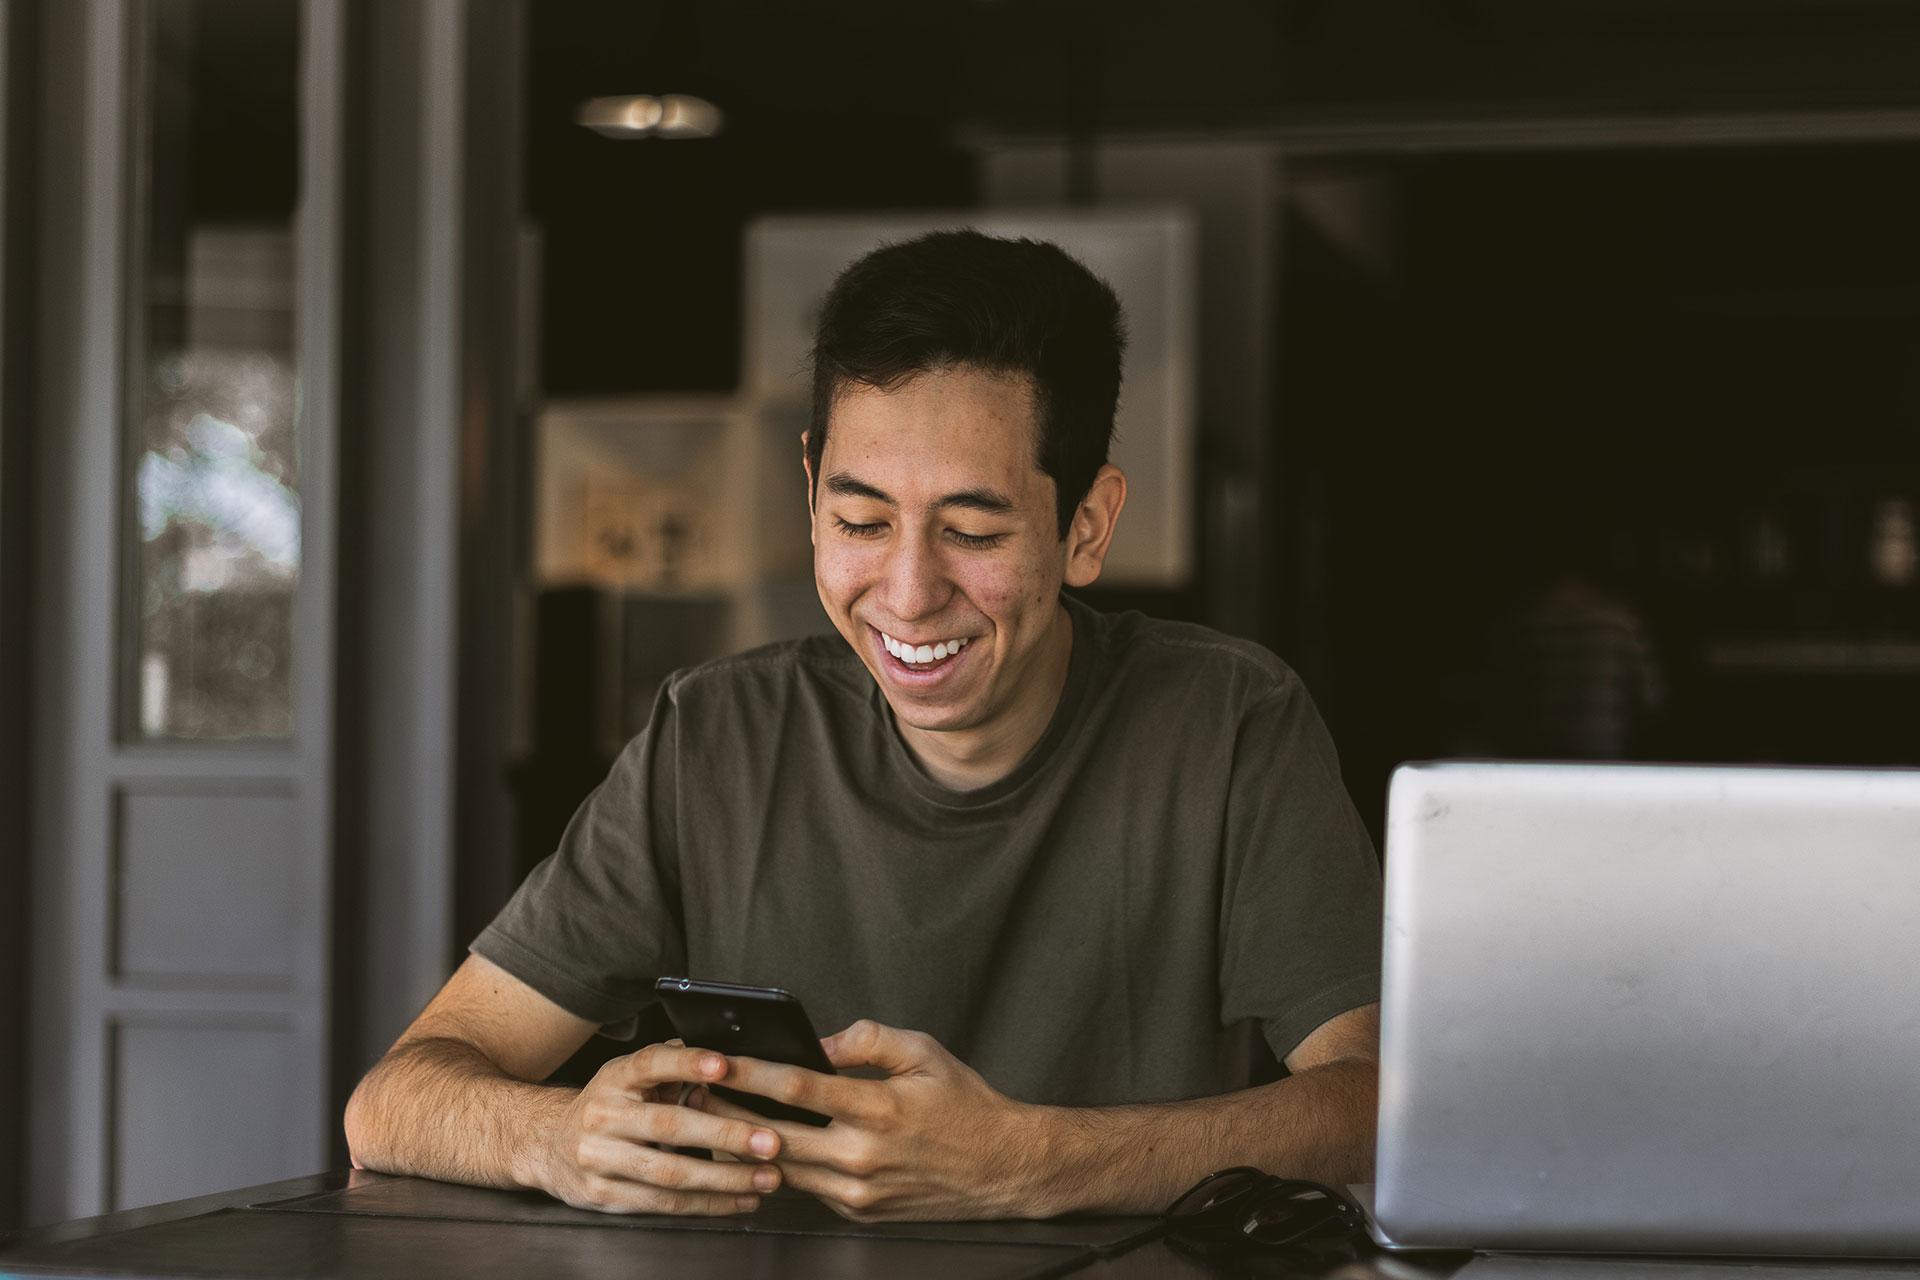 Male-Phone-Computer-Happy